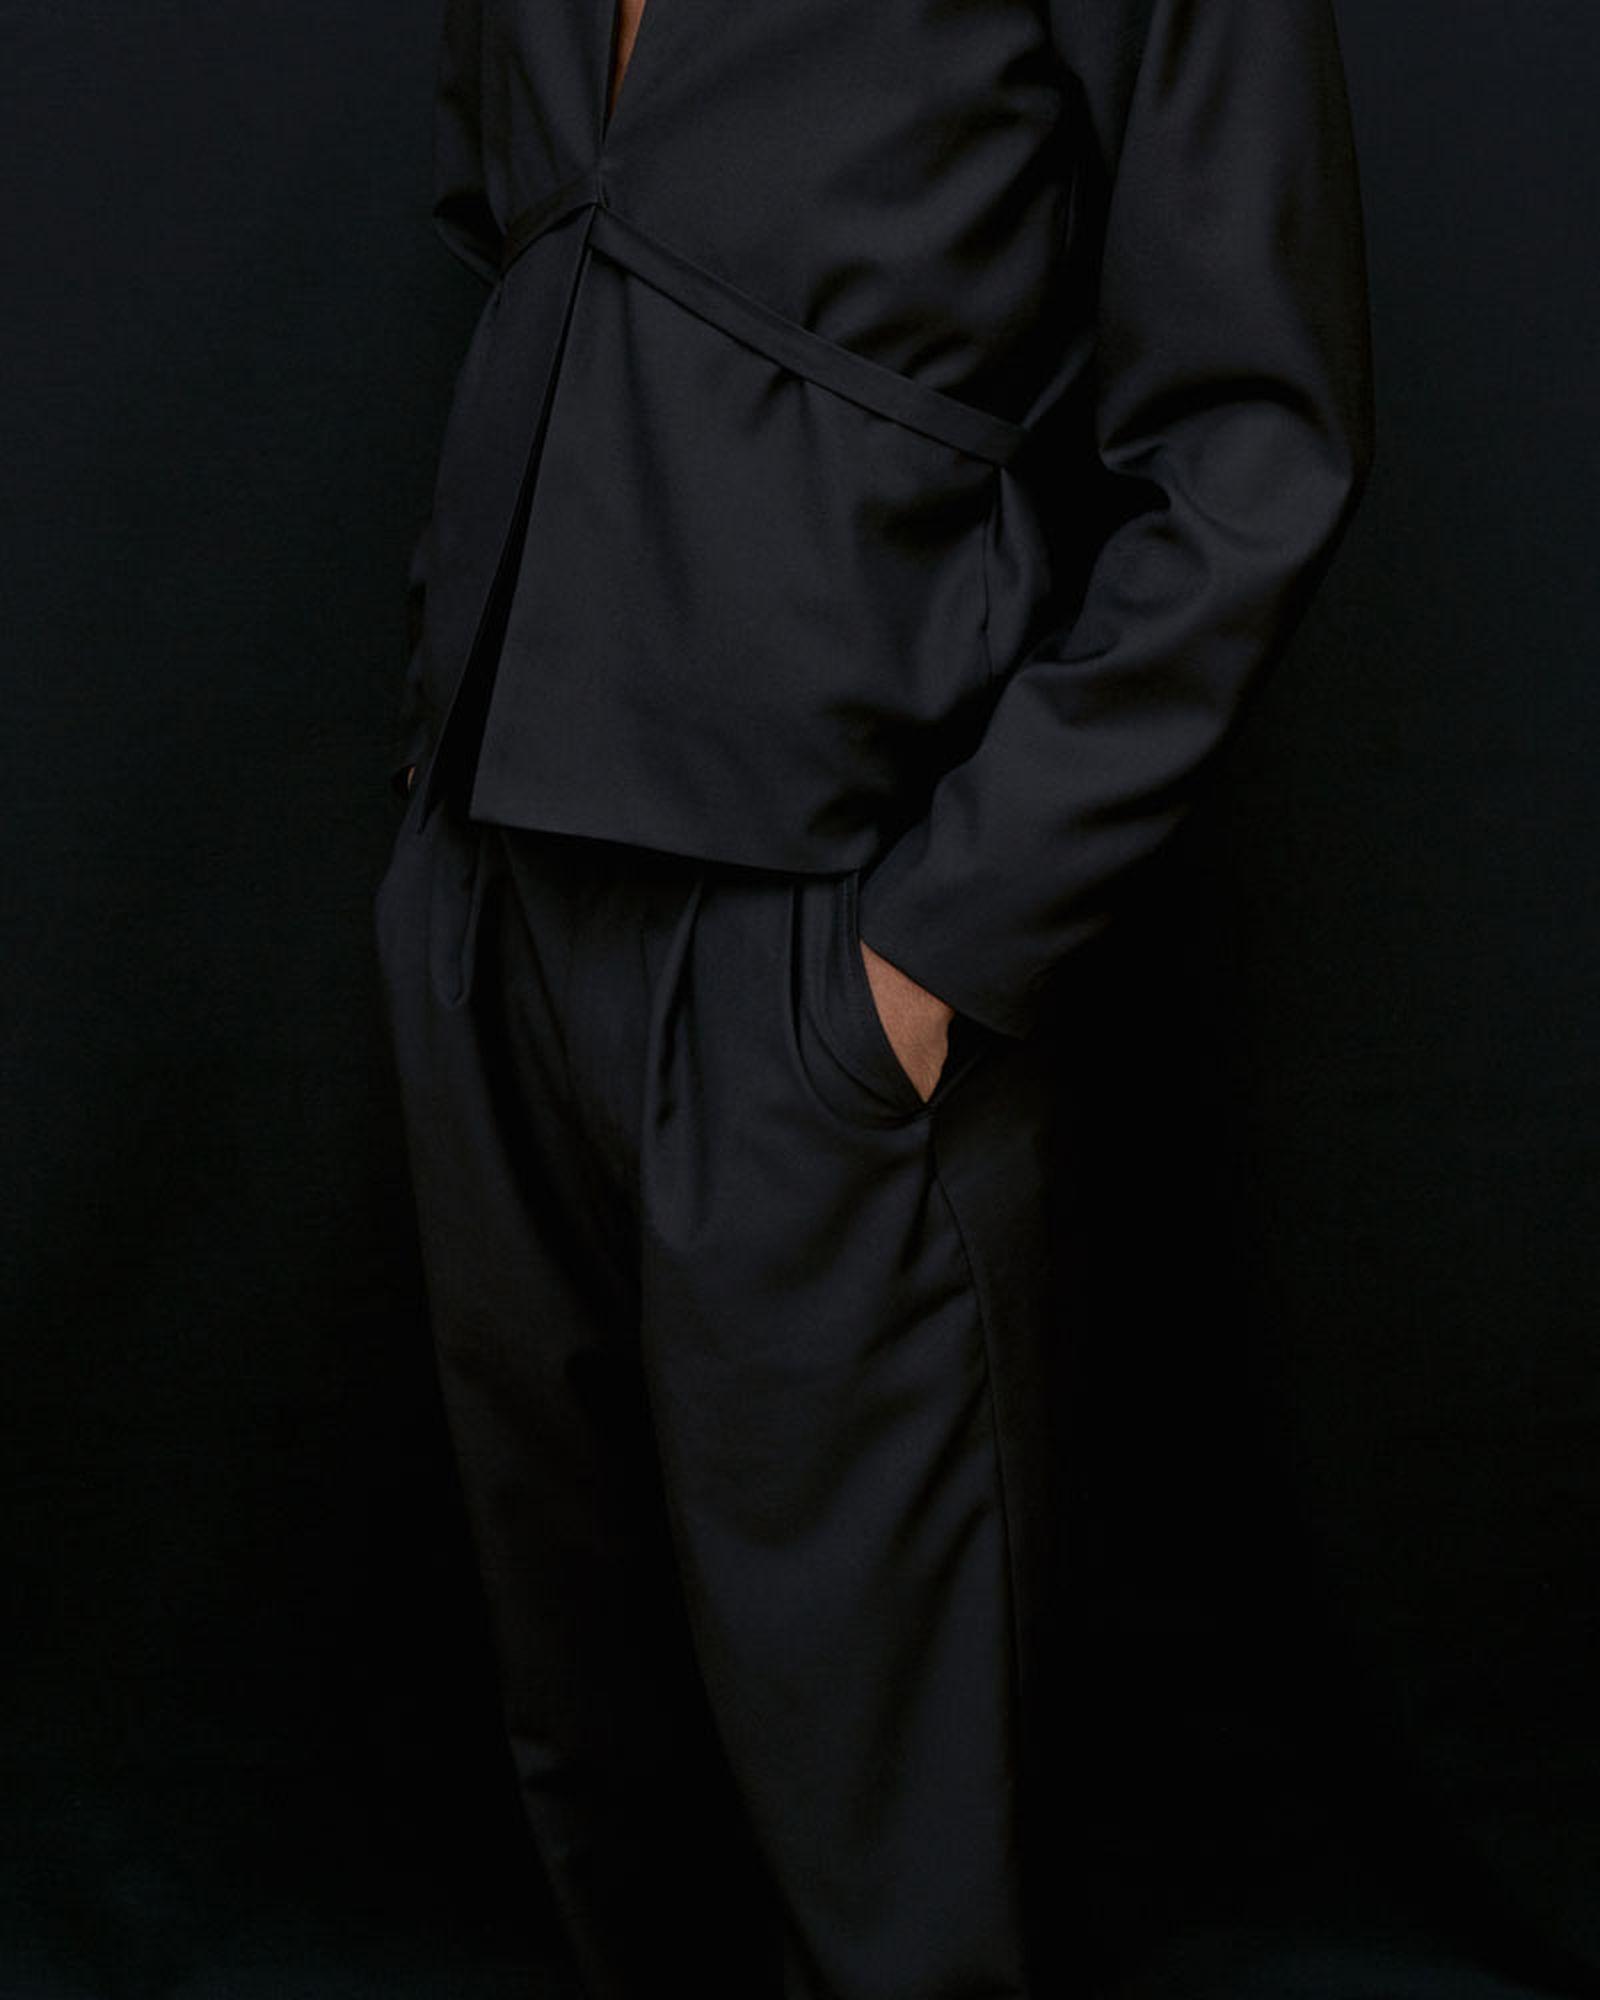 11one-dna-genderless-suiting-lookbook